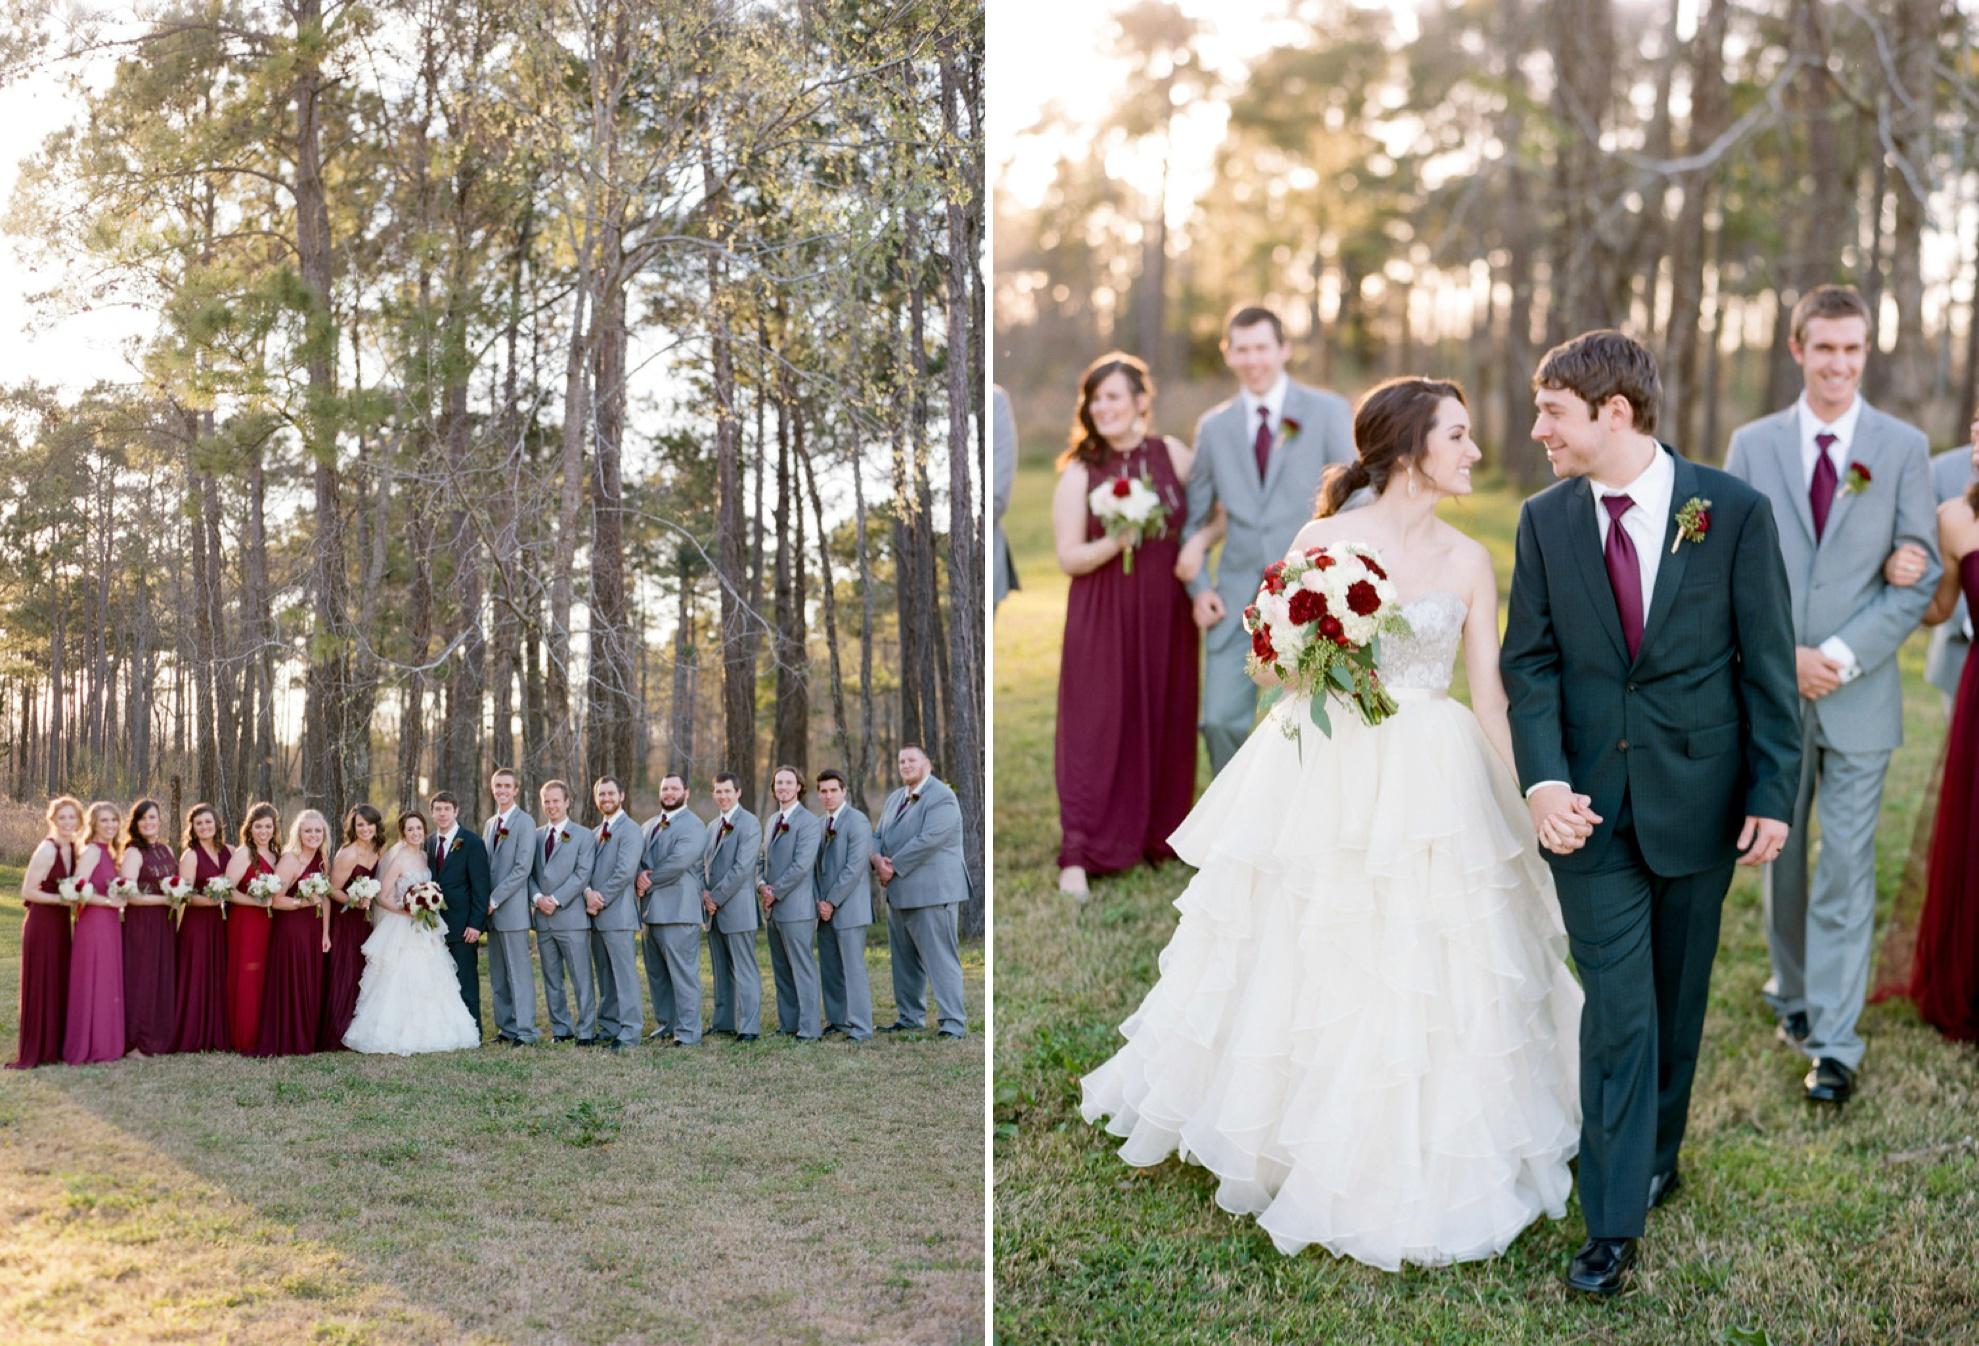 Tuscan-Courtyard-Wedding-Venue-Texas-City-Ceremony-Reception-Photographer-Dana-Fernandez-Photography-10.jpg